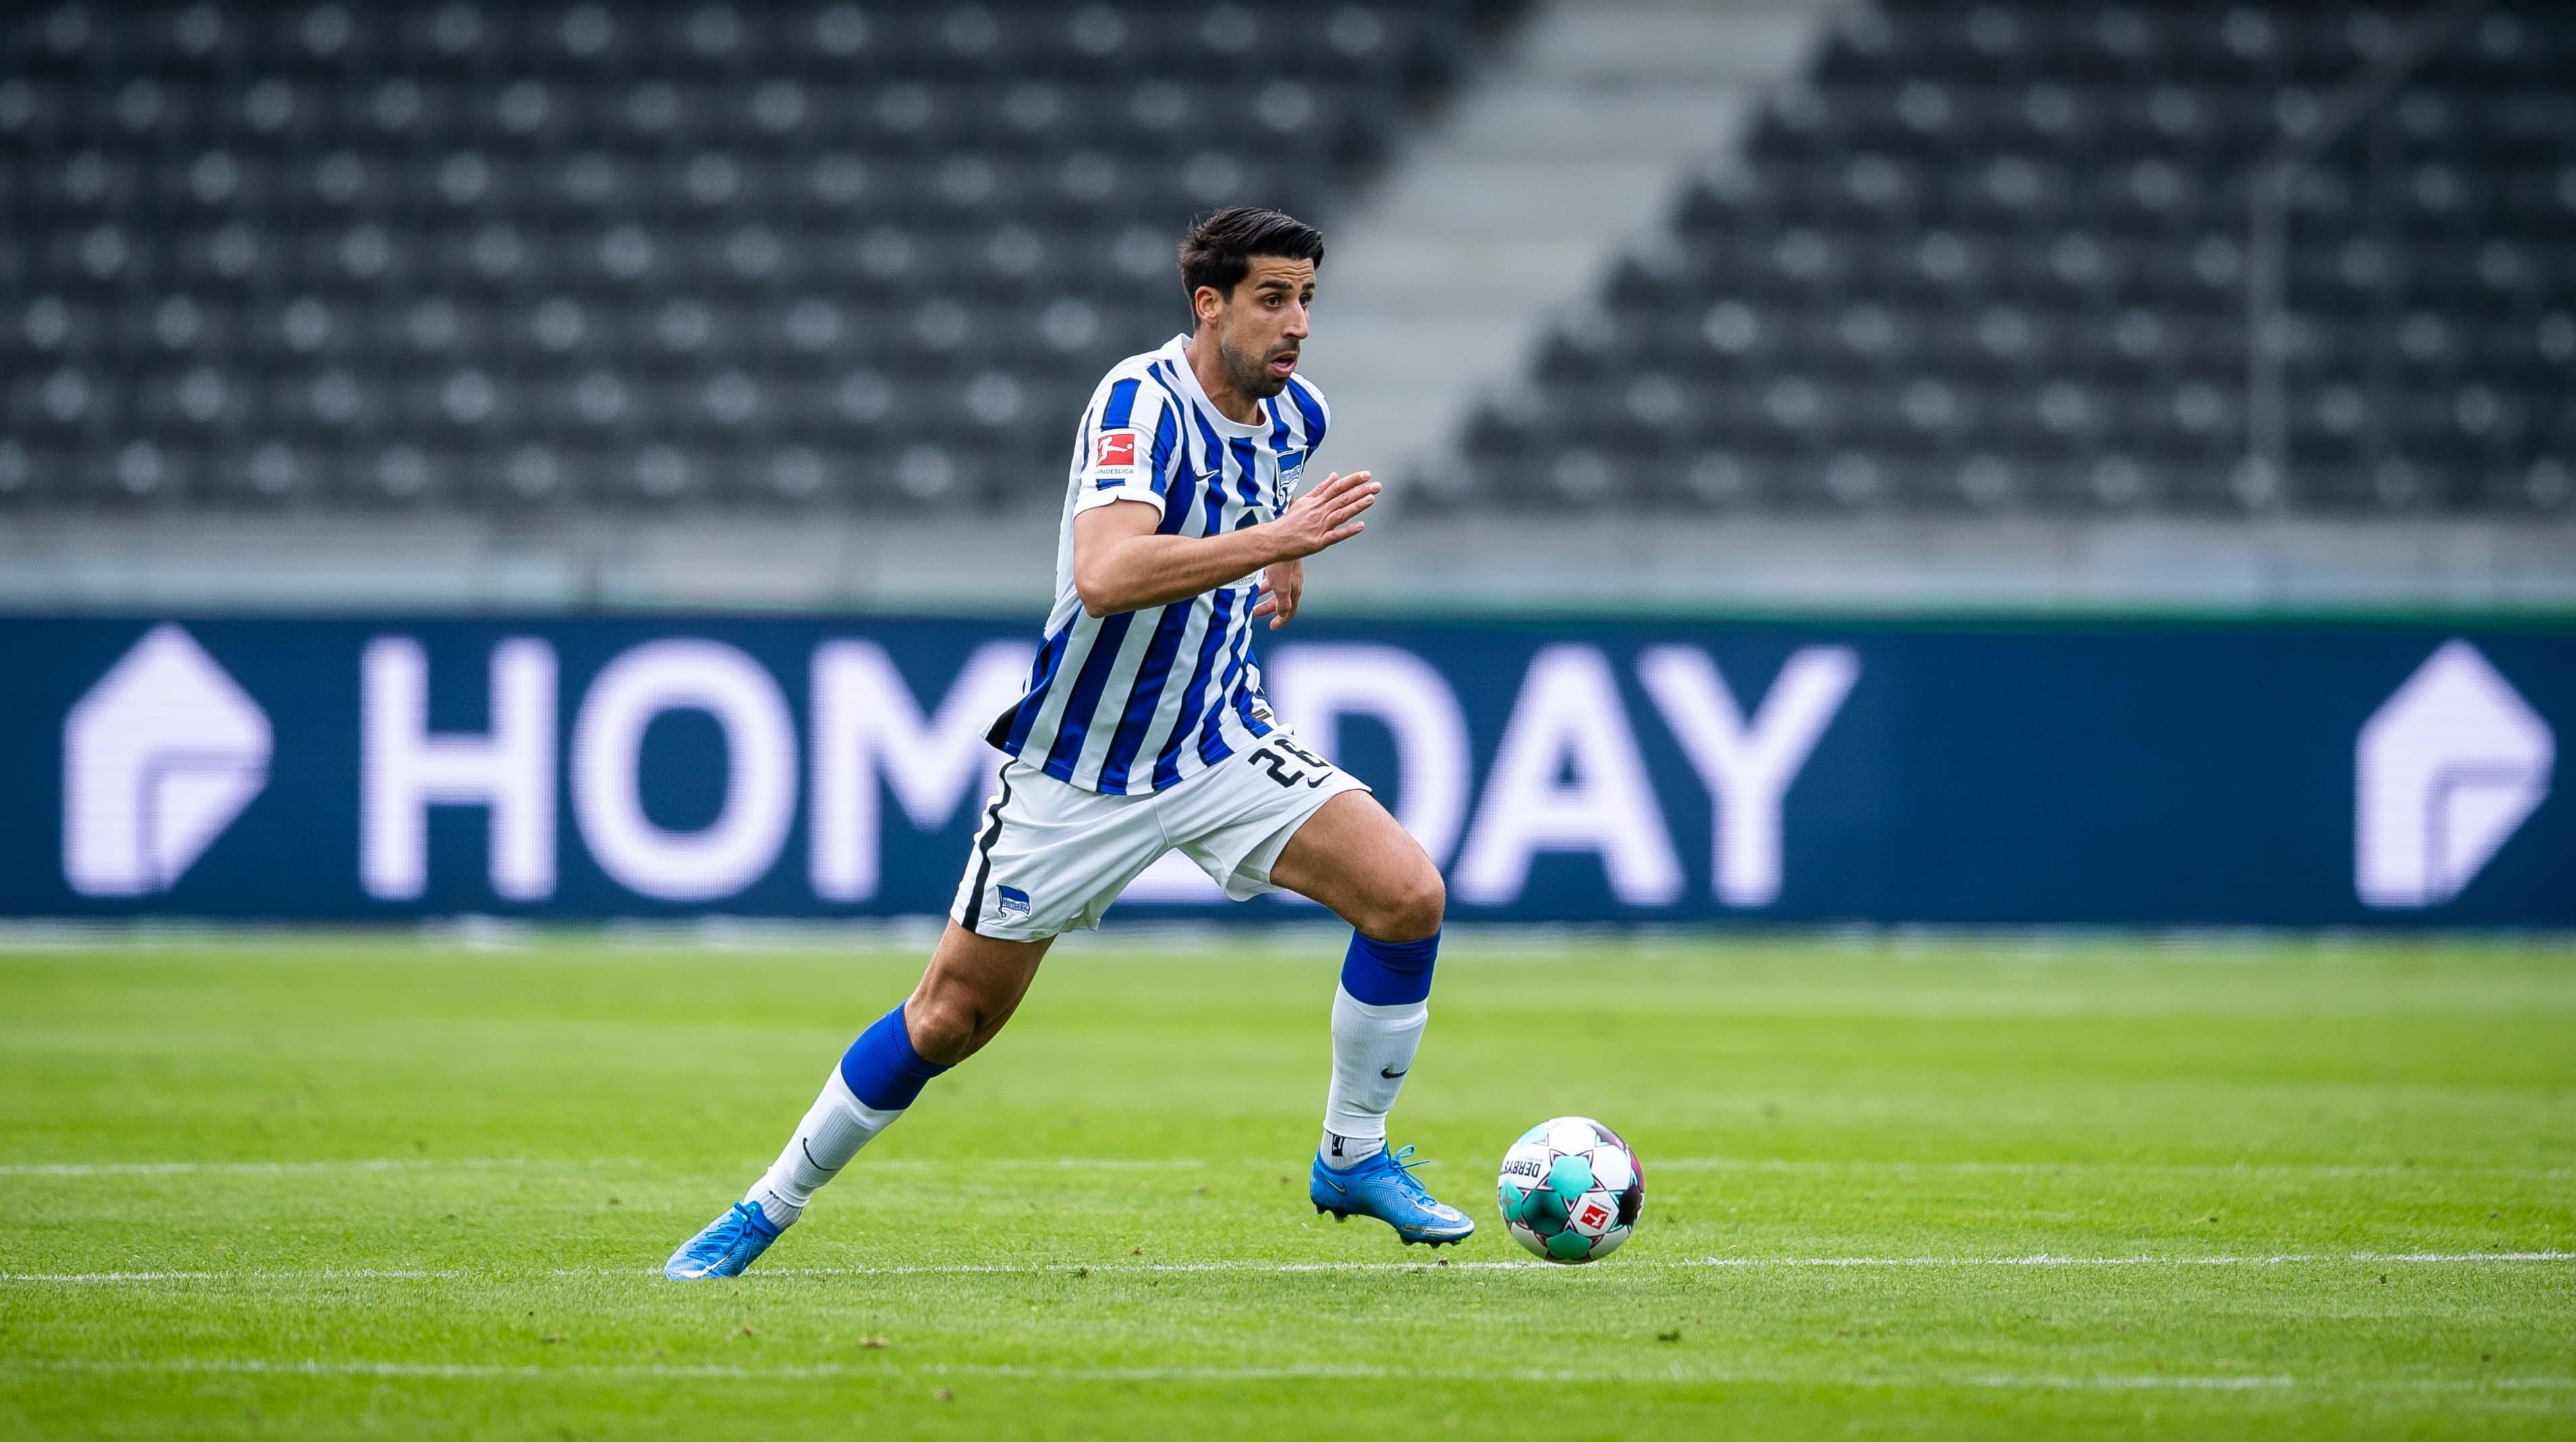 Sami Khedira on the ball.